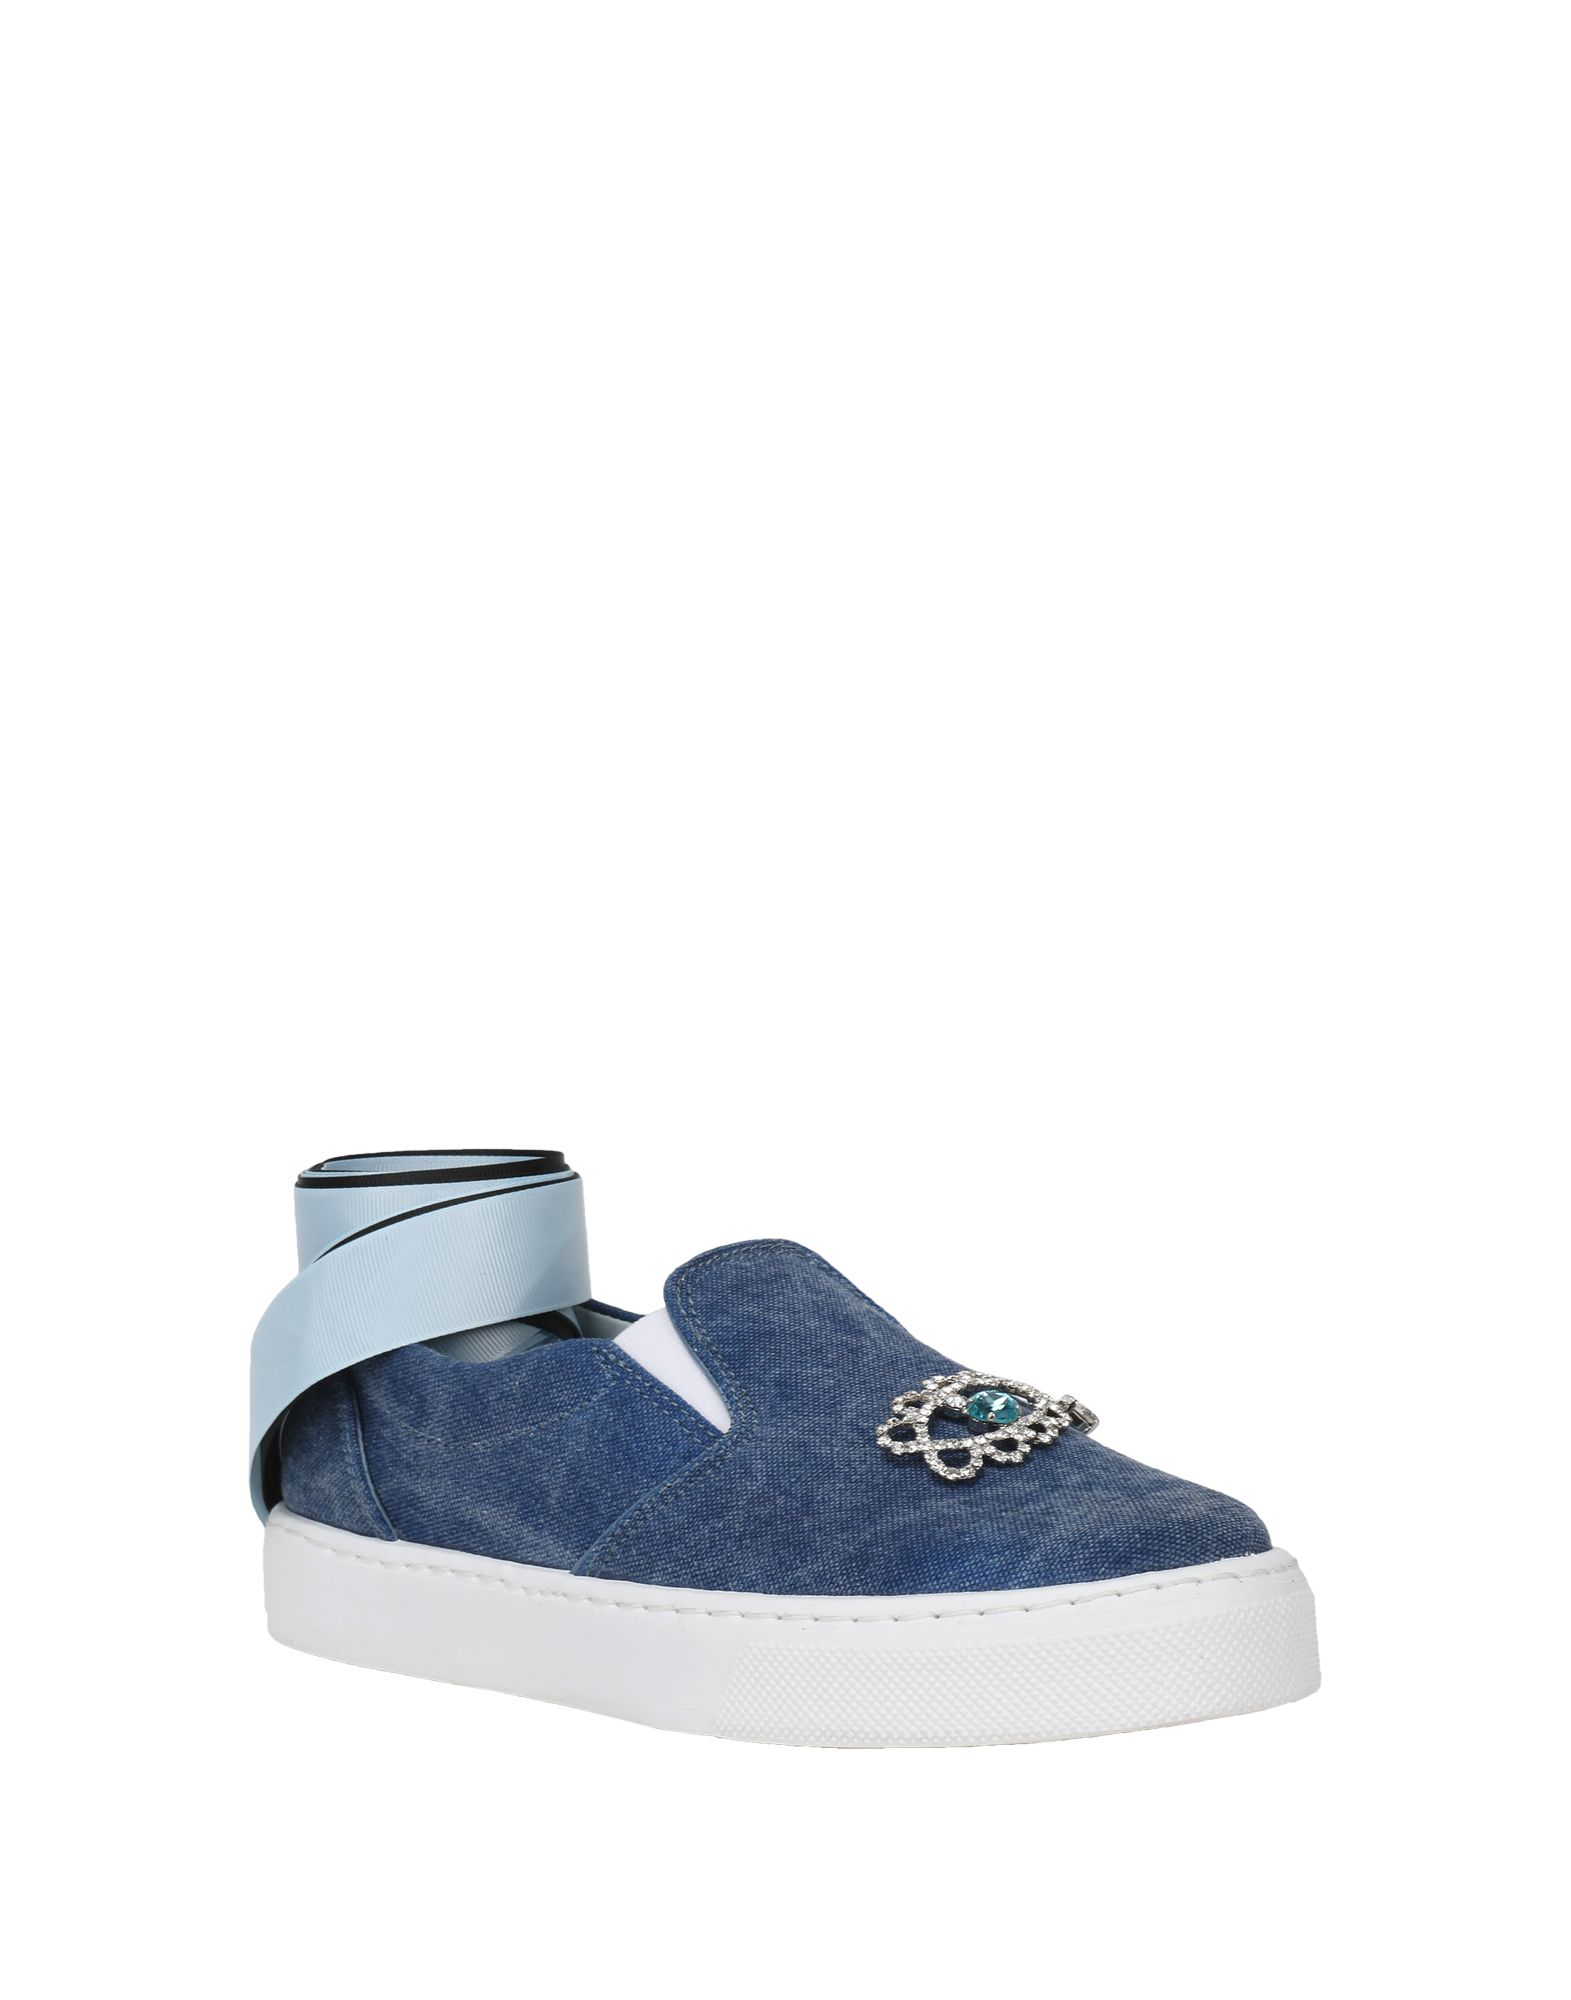 Stilvolle billige Schuhe Chiara Ferragni 11554811TJ Sneakers Damen  11554811TJ Ferragni 0b8105